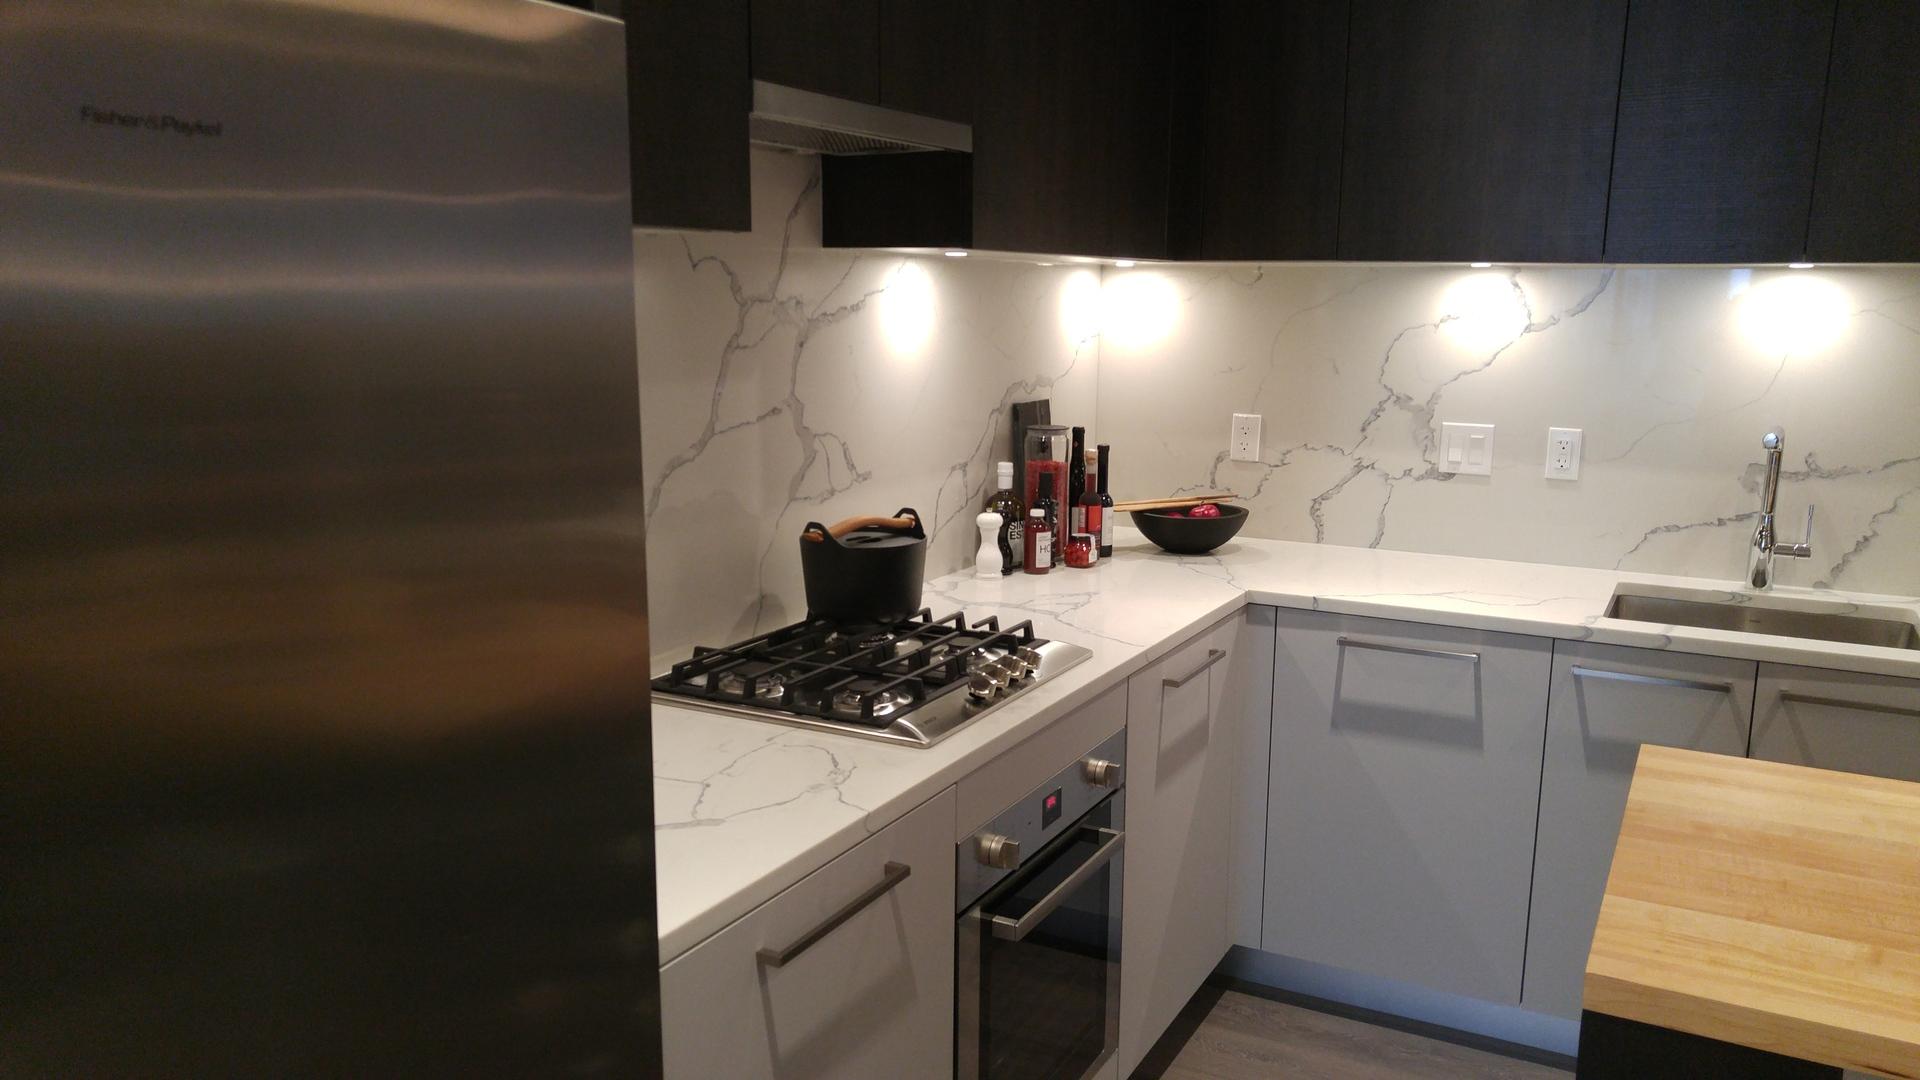 567-clarke-como-b-plan-kitchen-dark-colour-scheme at 567 Clarke and Como (567 Clarke Road, Coquitlam West, Coquitlam)